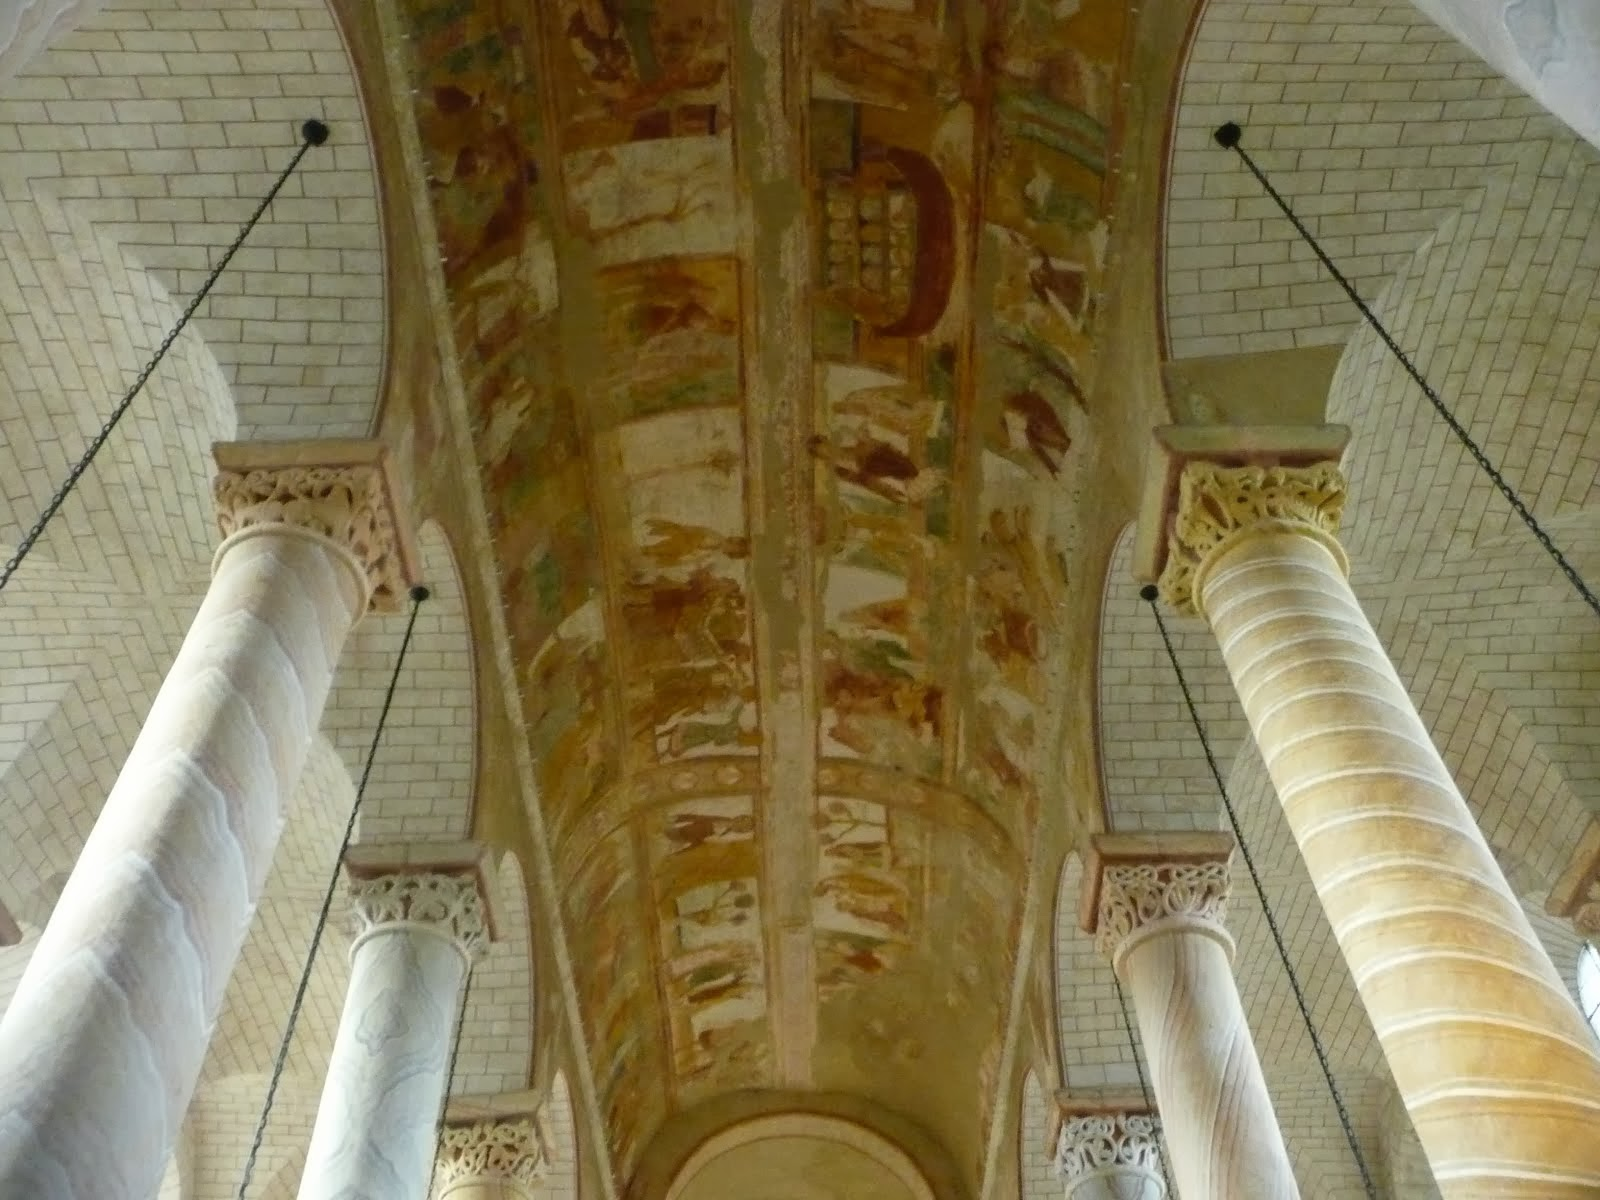 Ceiling of the Abby Church, Saint-Savin-sur-Gartempe